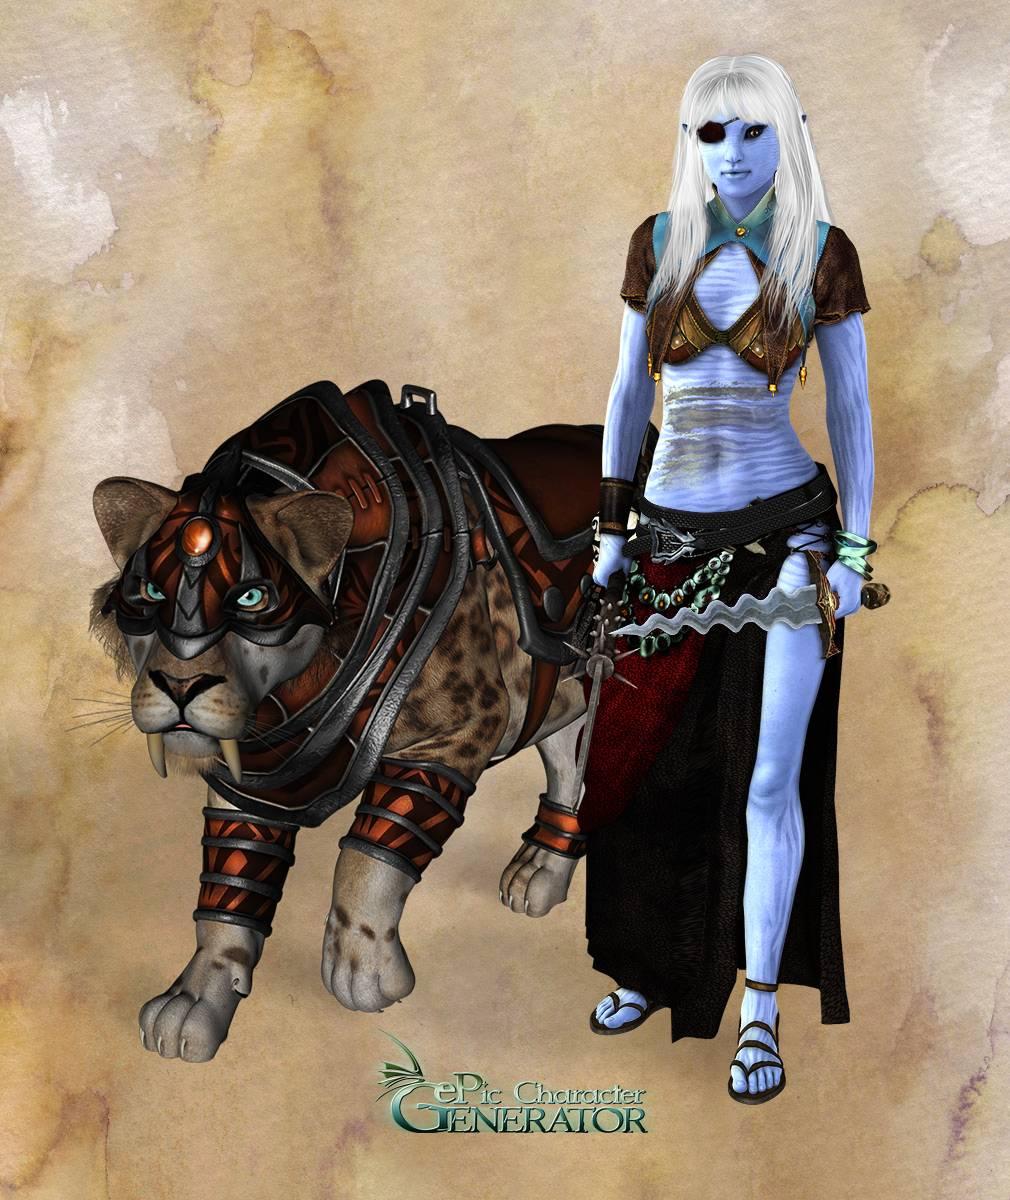 ePic Character Generator Season 2 Fantasy Bestiary Screenshot 11